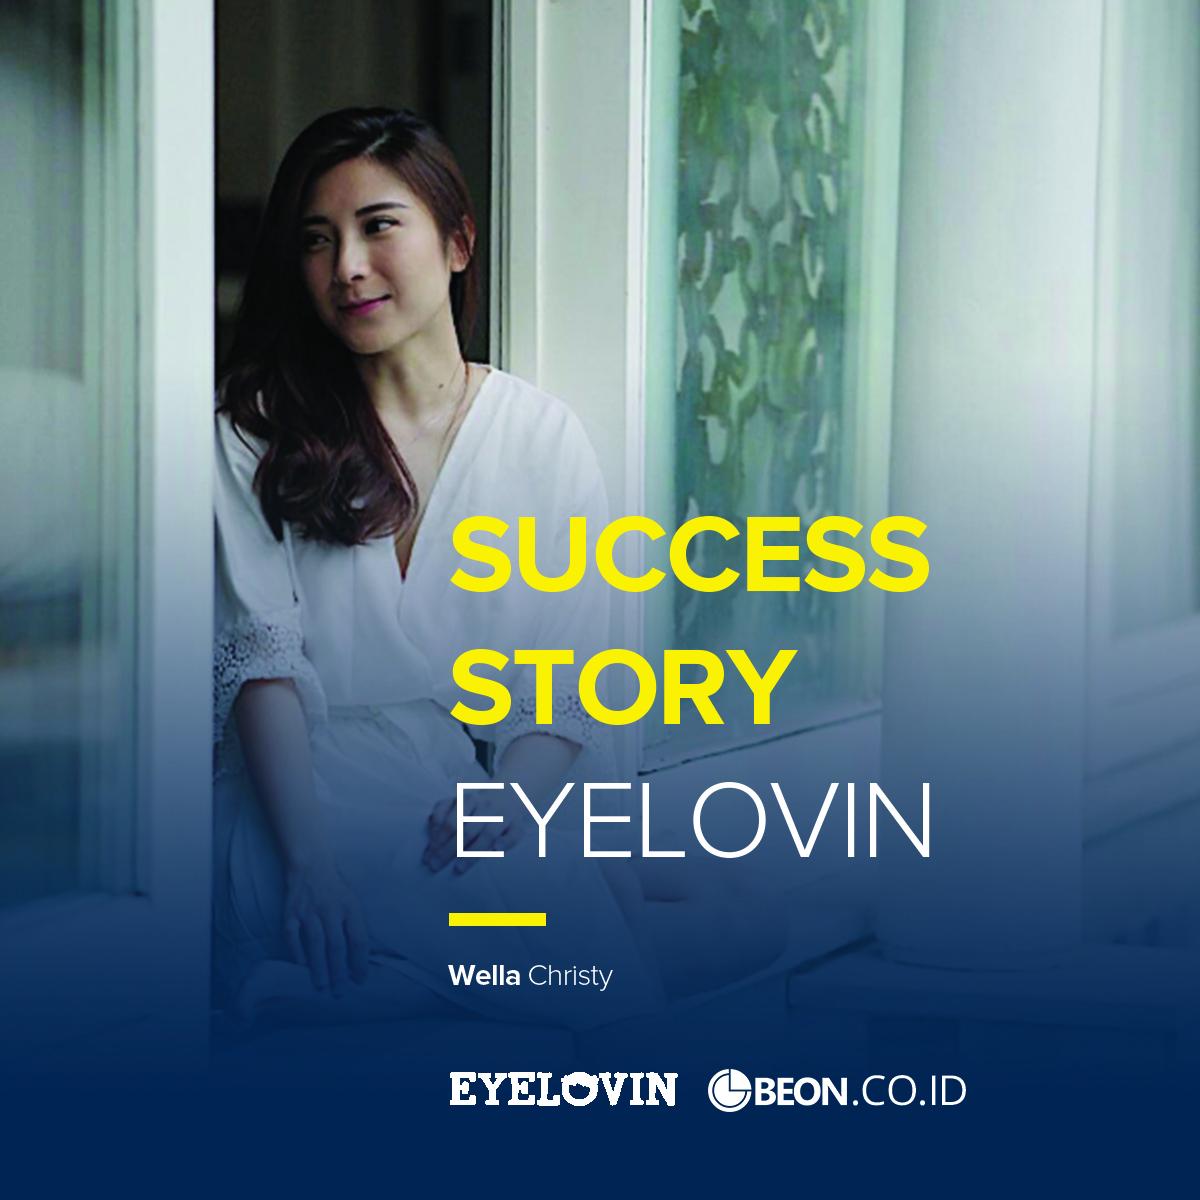 Success Story Eyelovin